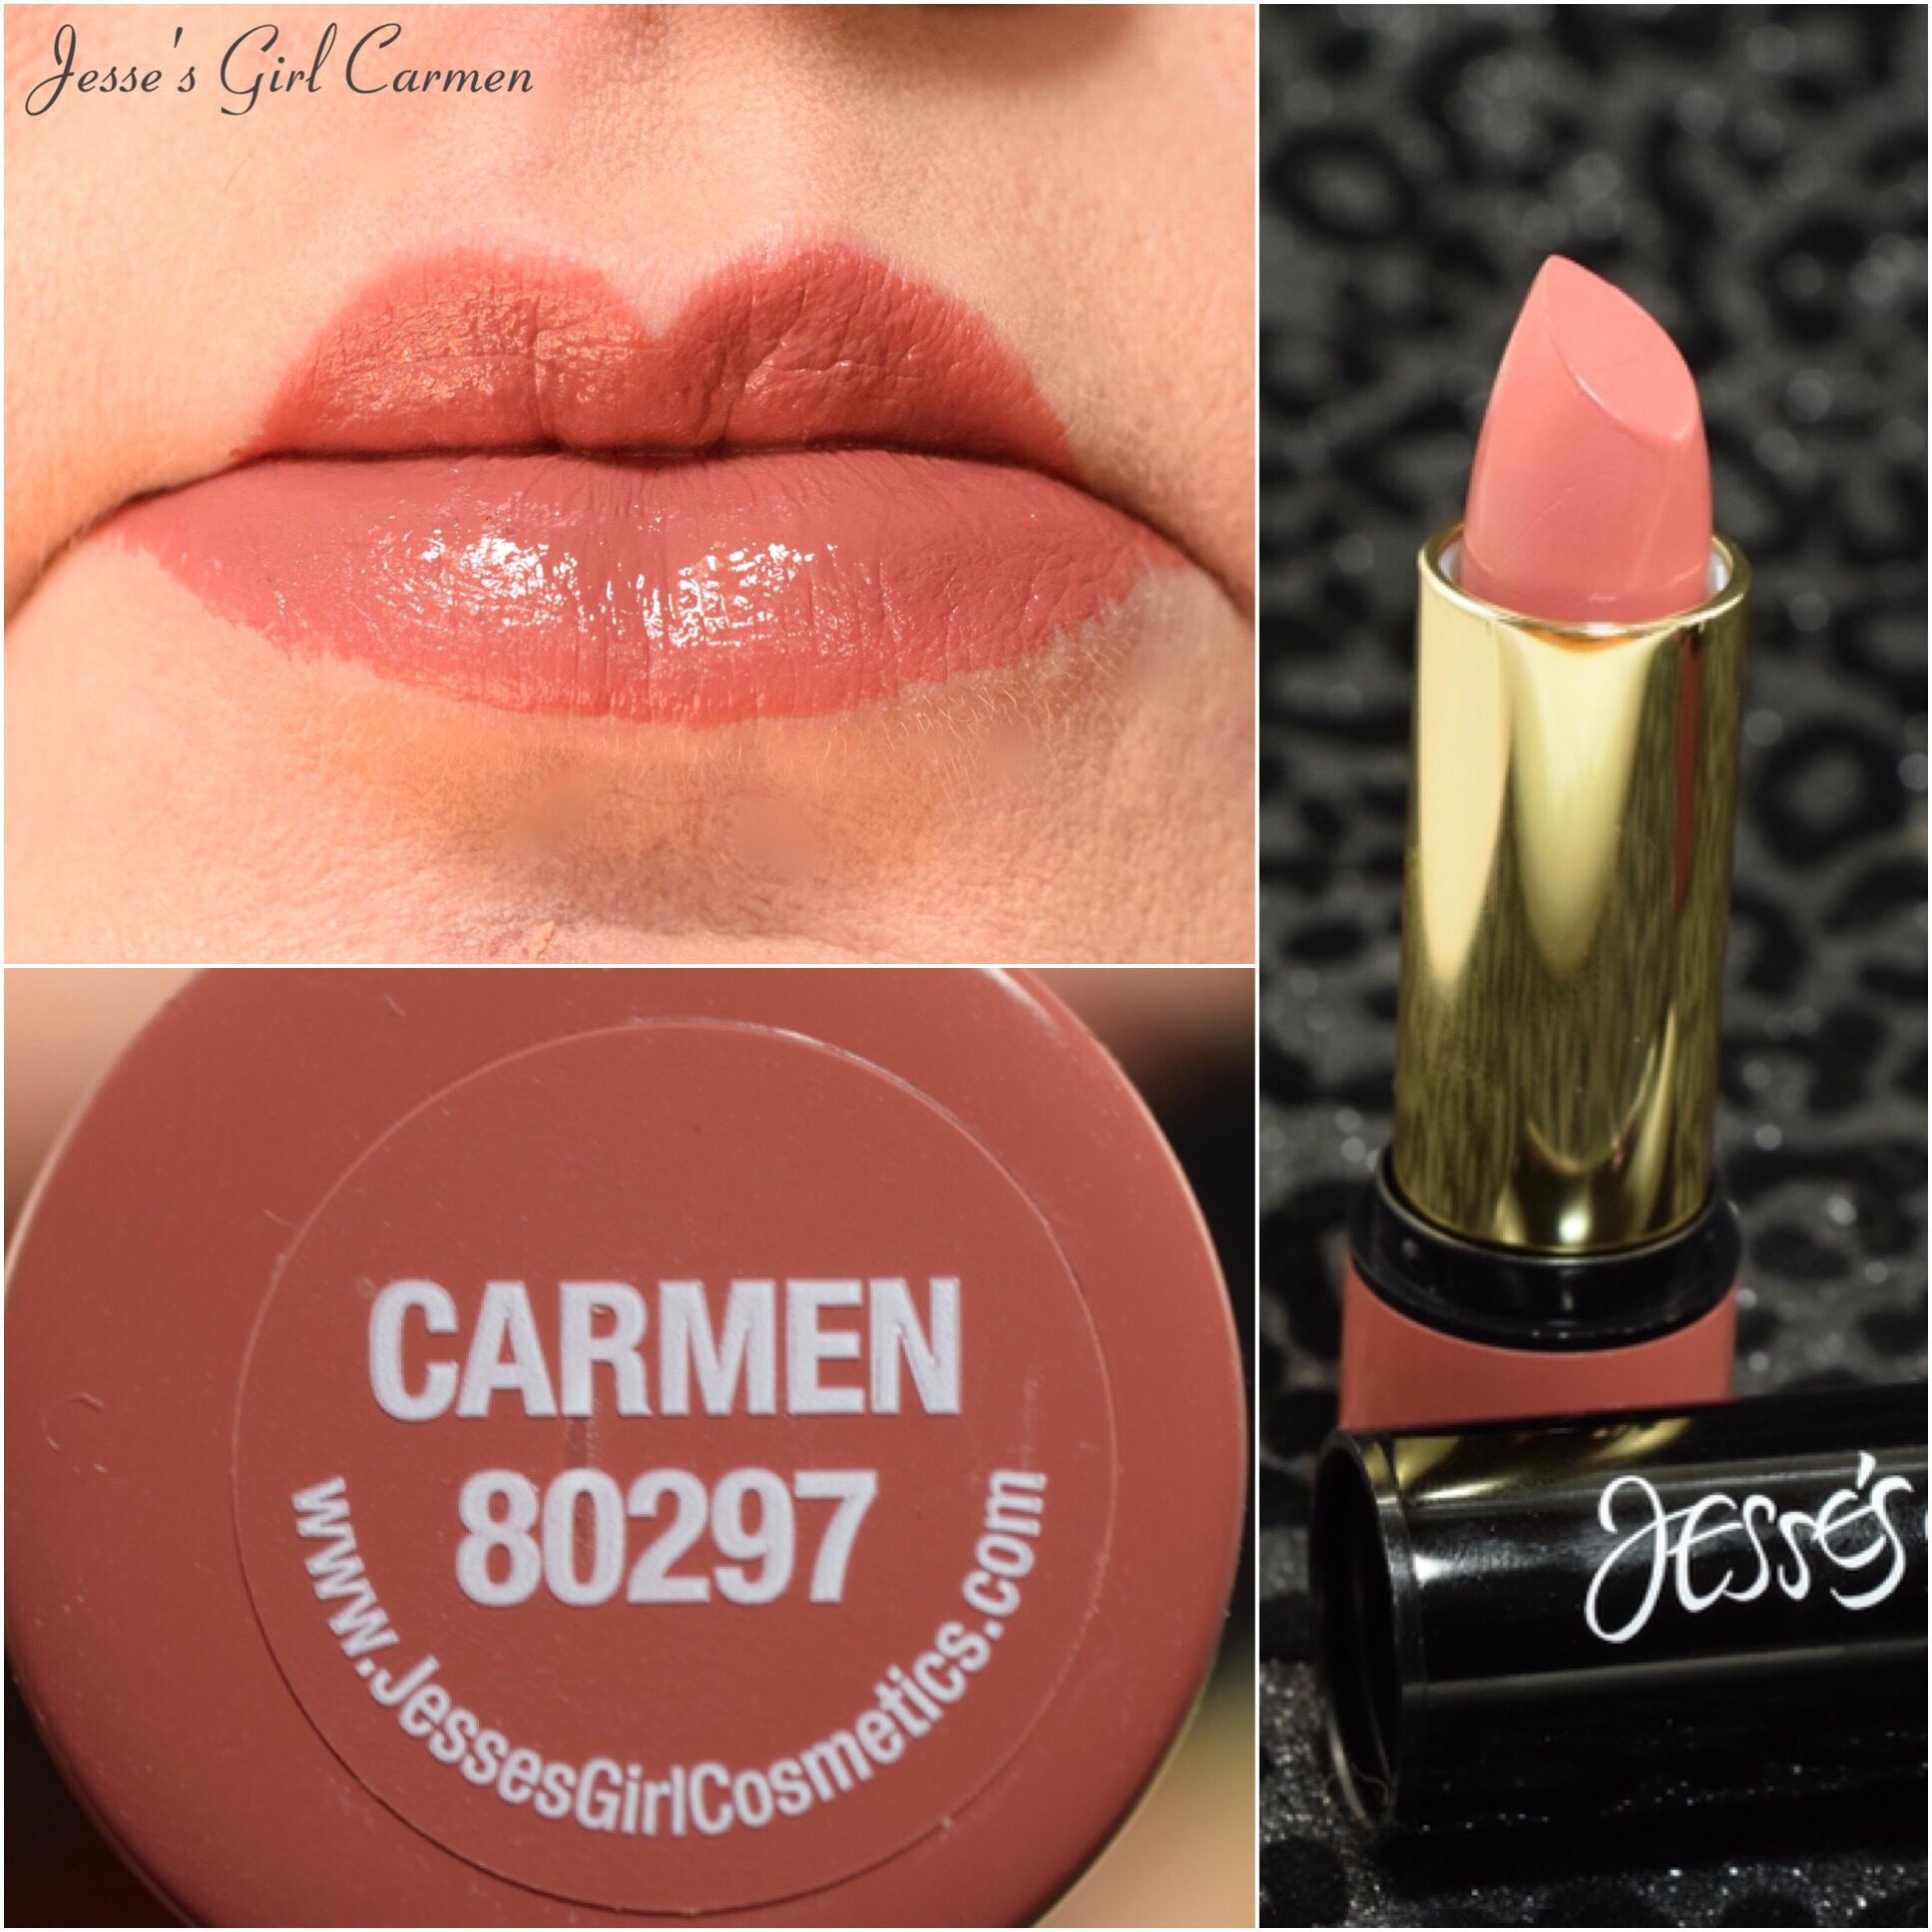 Jesse's Girl Carmen